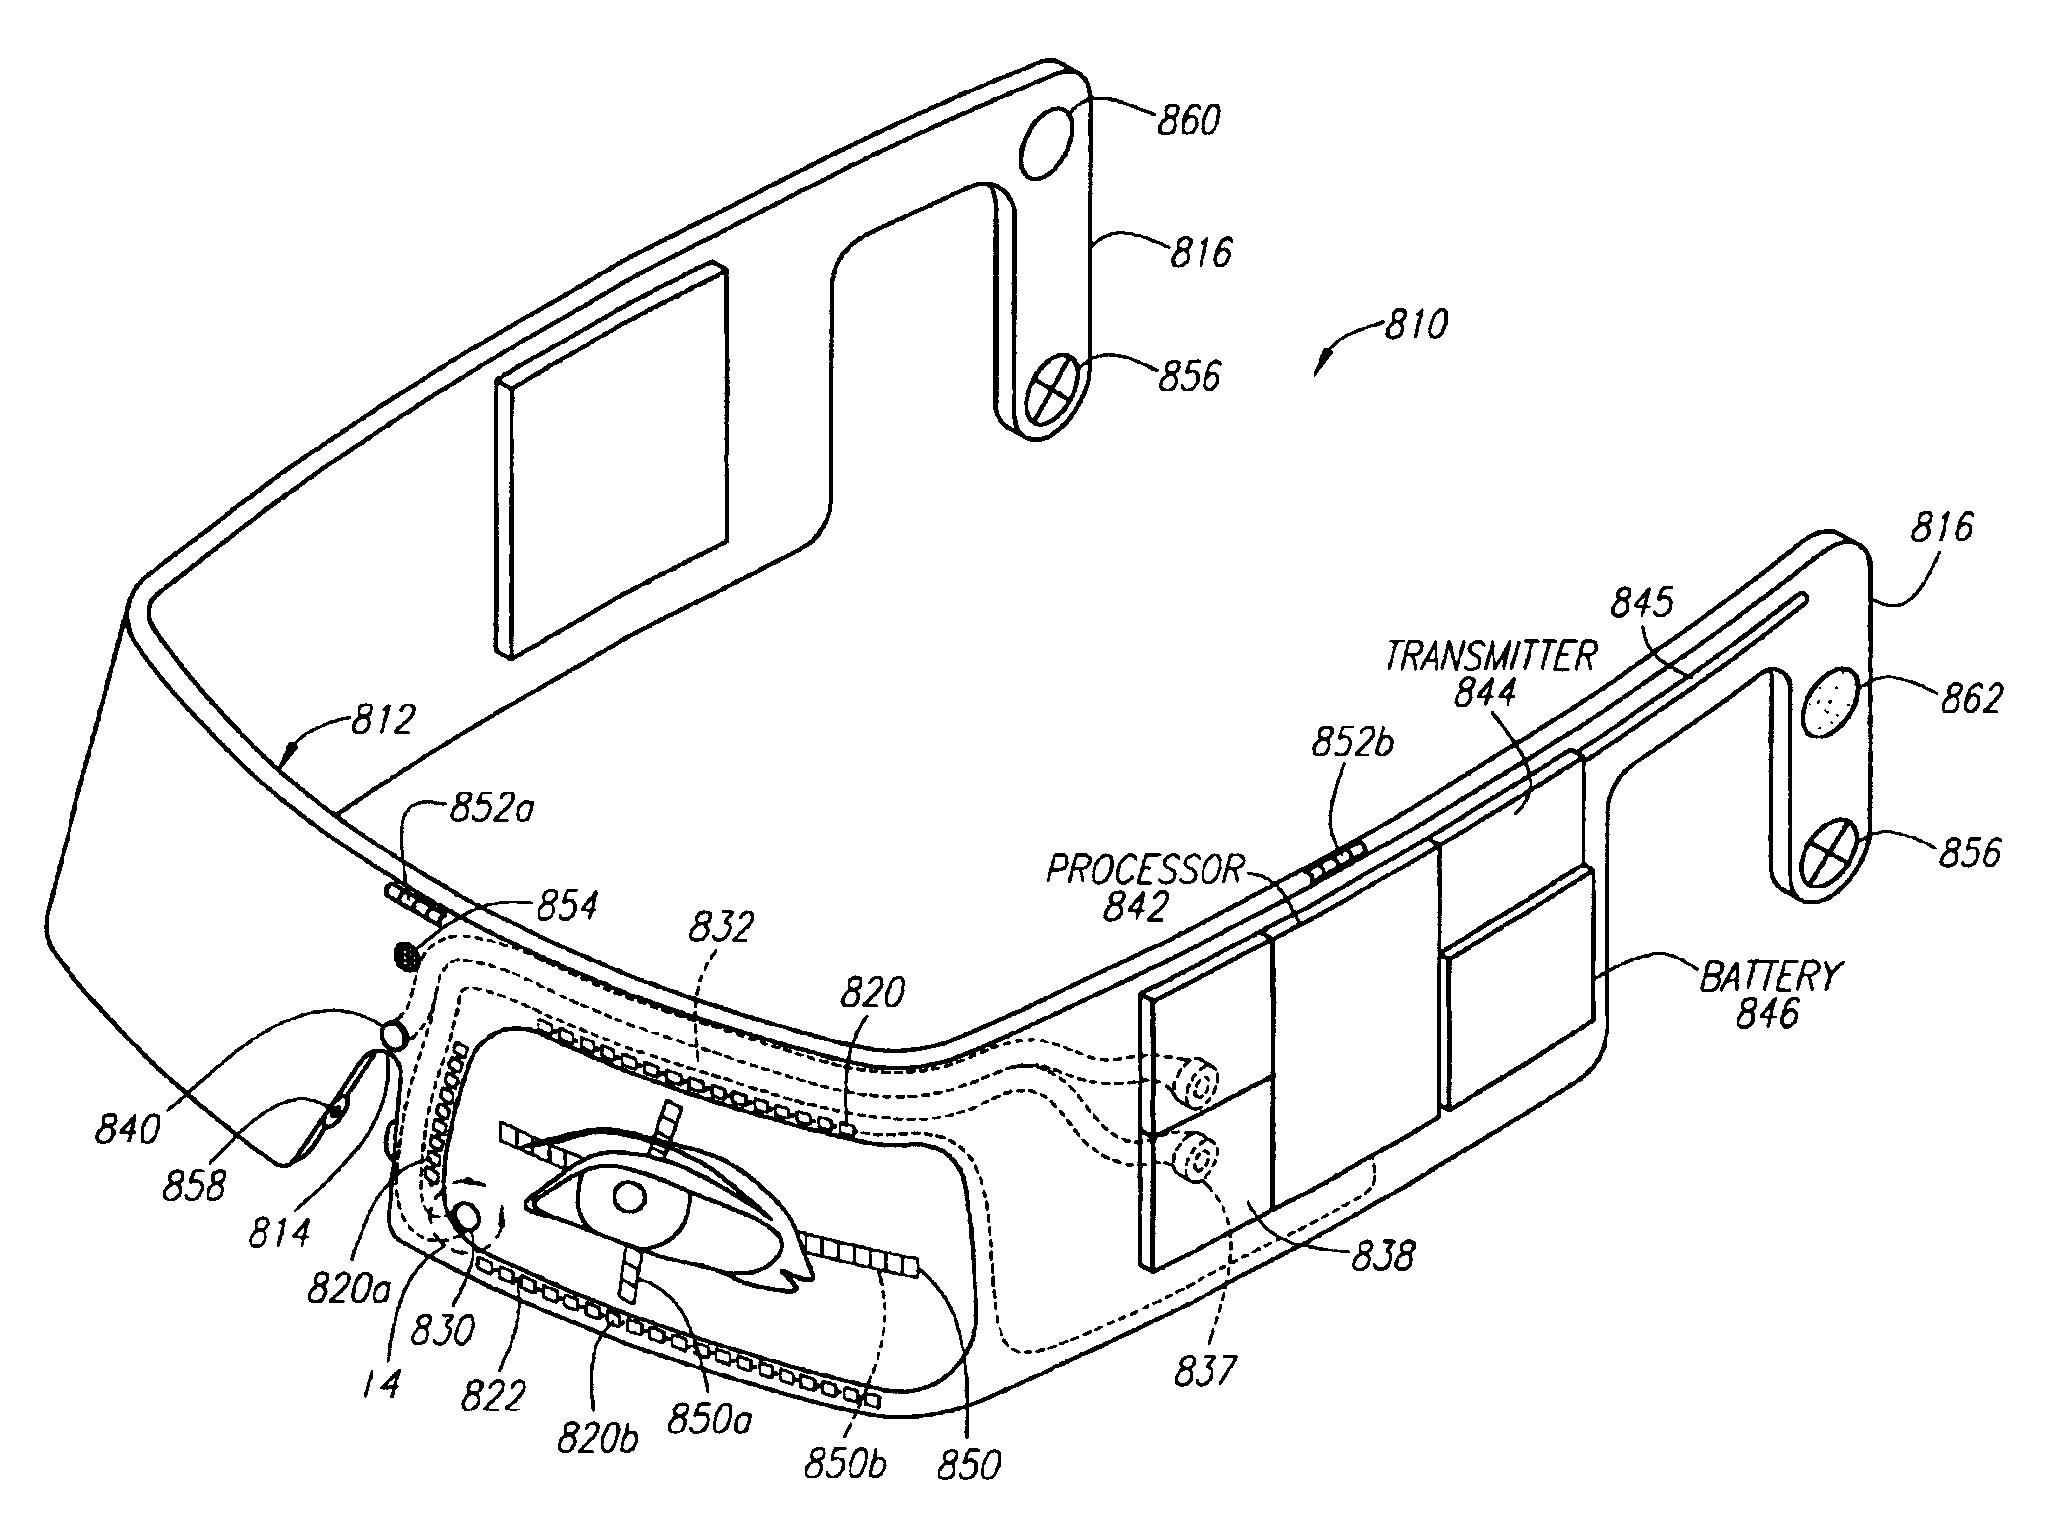 Refrigerated Truck Wiring Diagram. Diagram. Auto Wiring